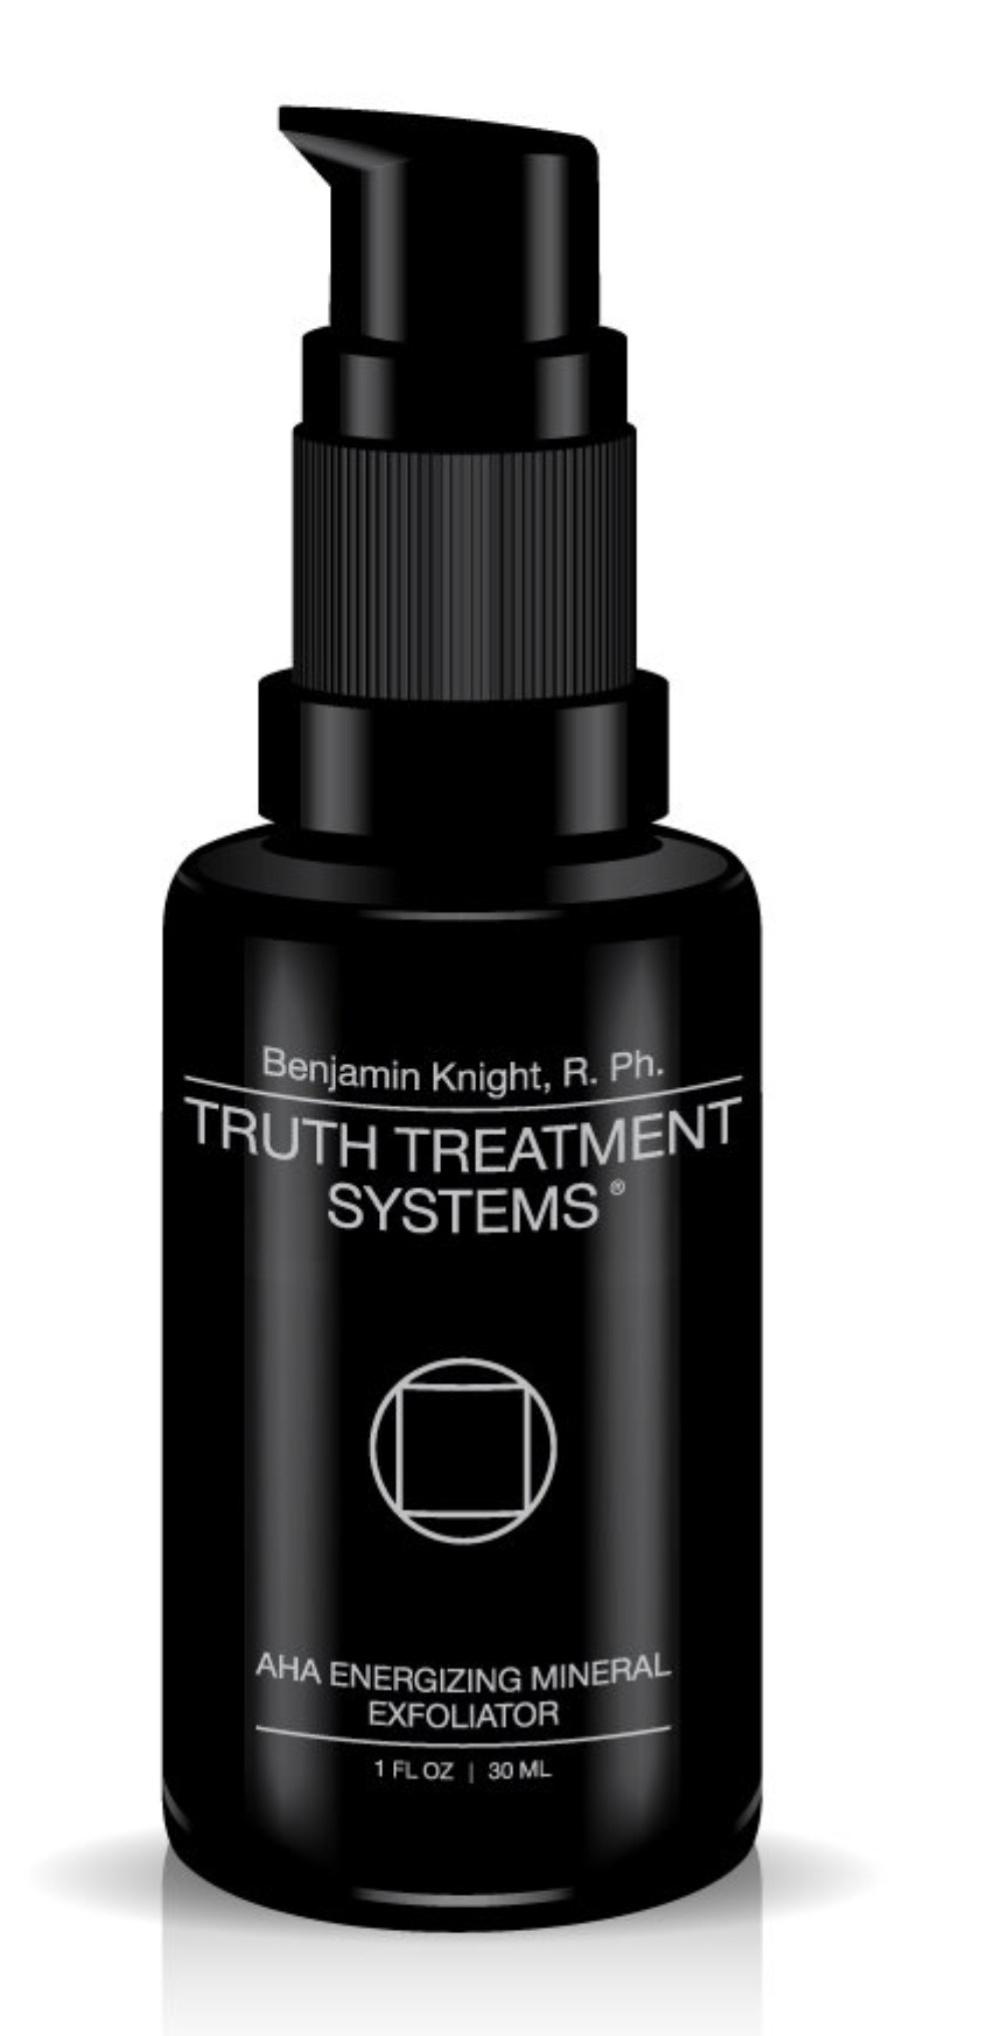 Truth treatments Aha Energizing Mineral Exfoliator™